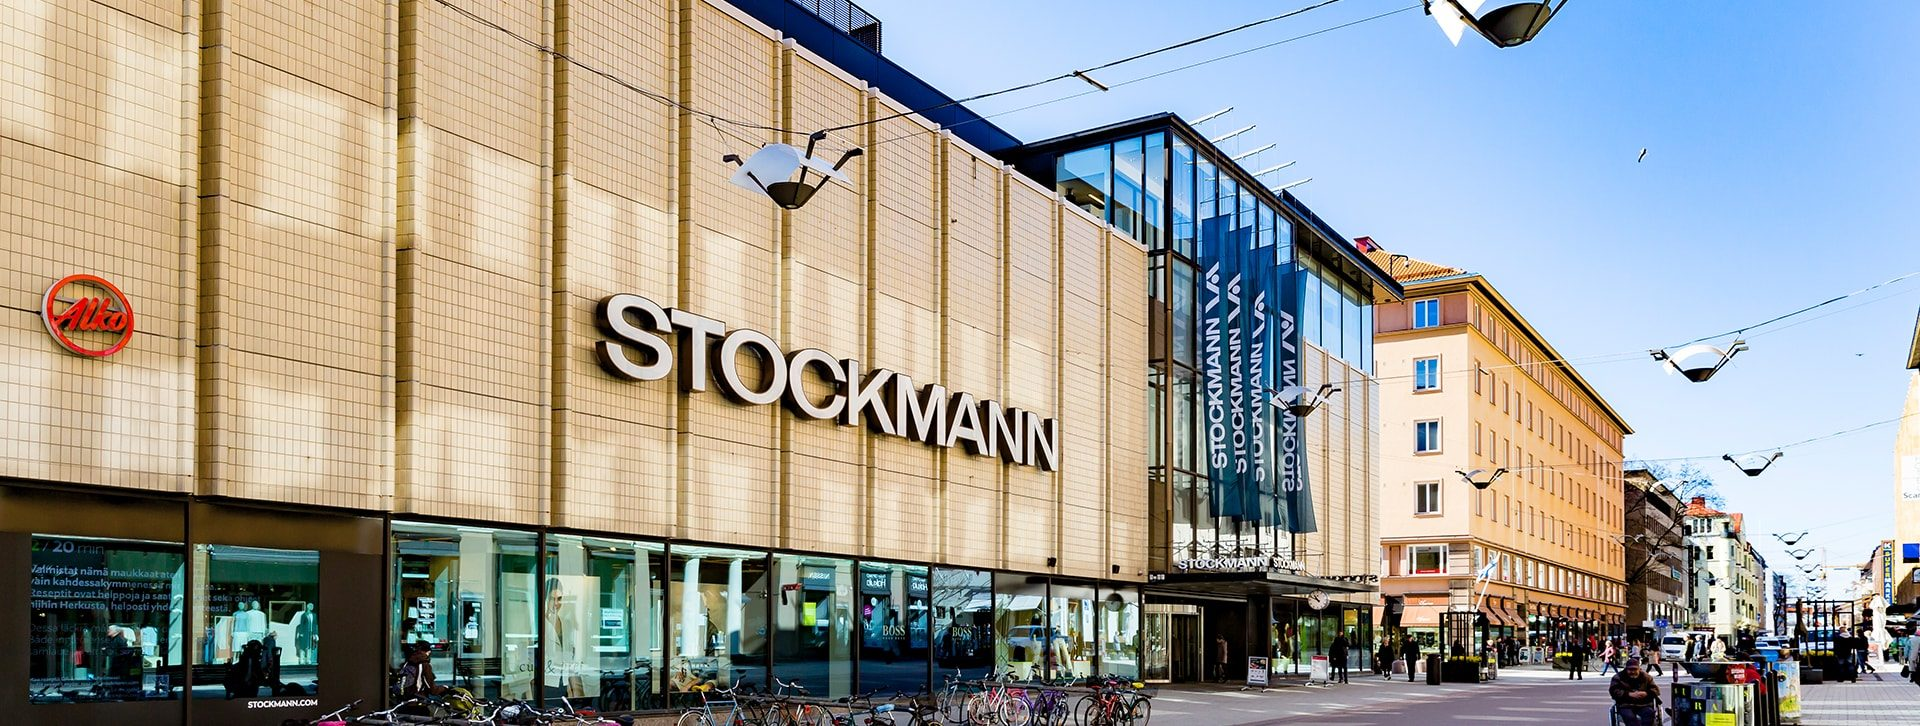 hansakortteli_stockmann_2